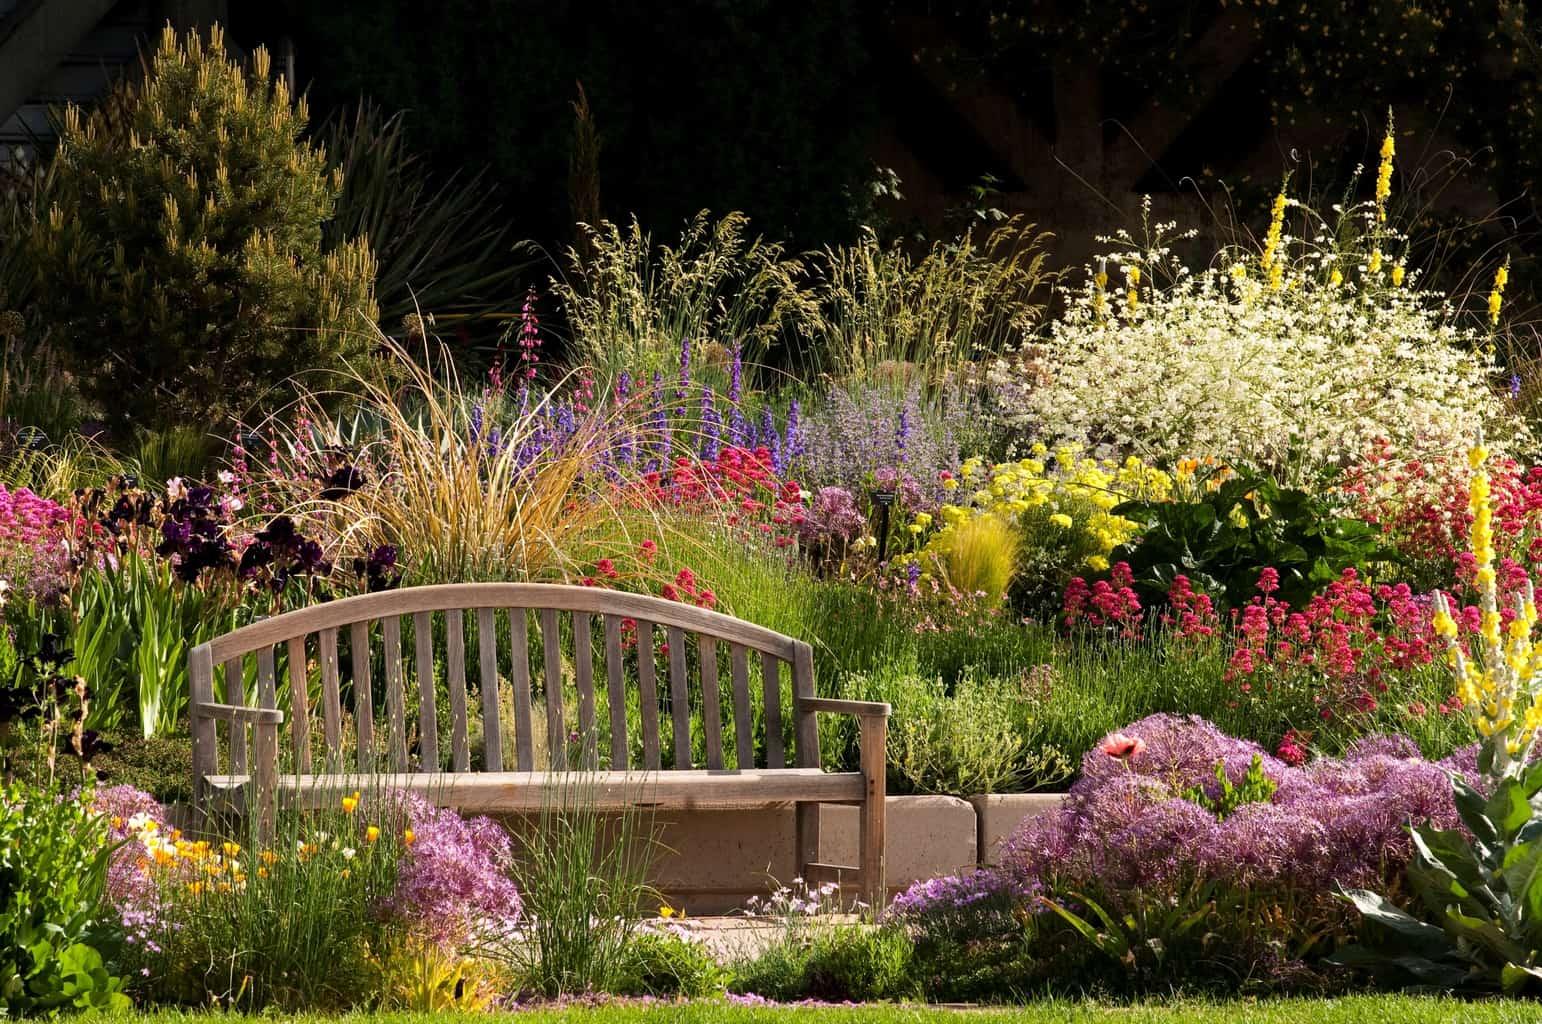 Culver City Offers Smart Gardening Workshops | Culver City Crossroads